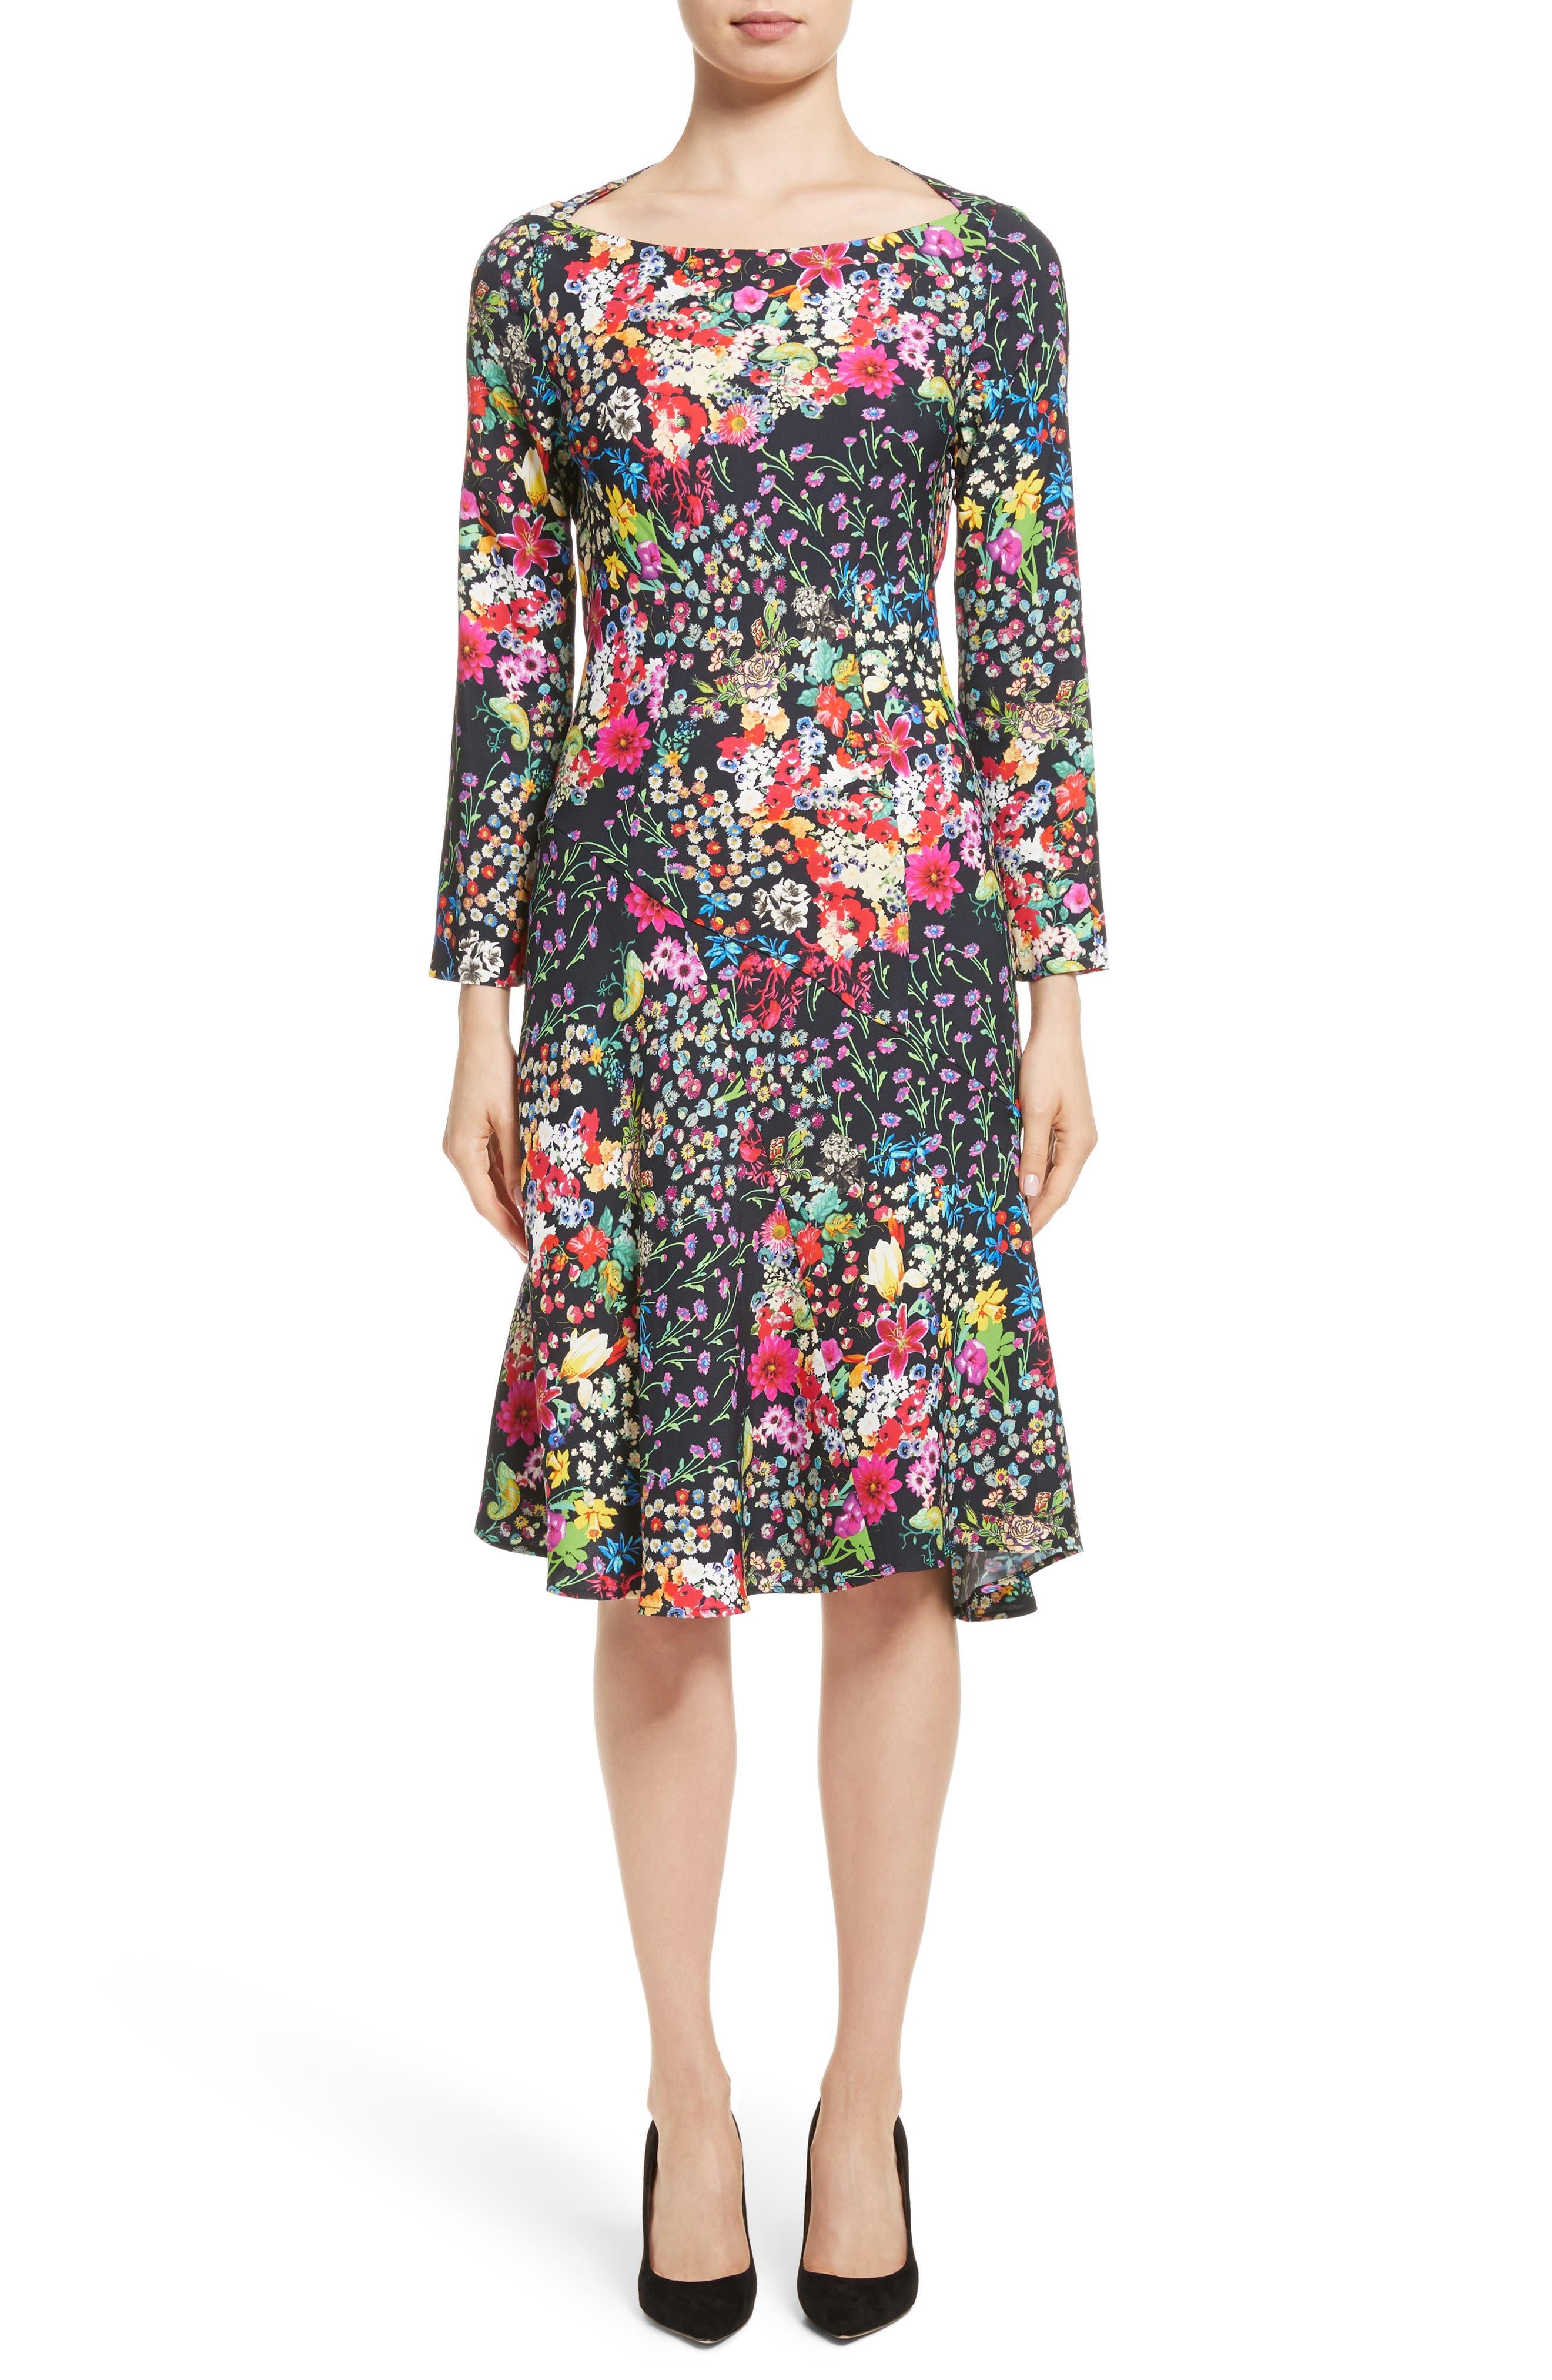 Etro Micro Floral Print Dress